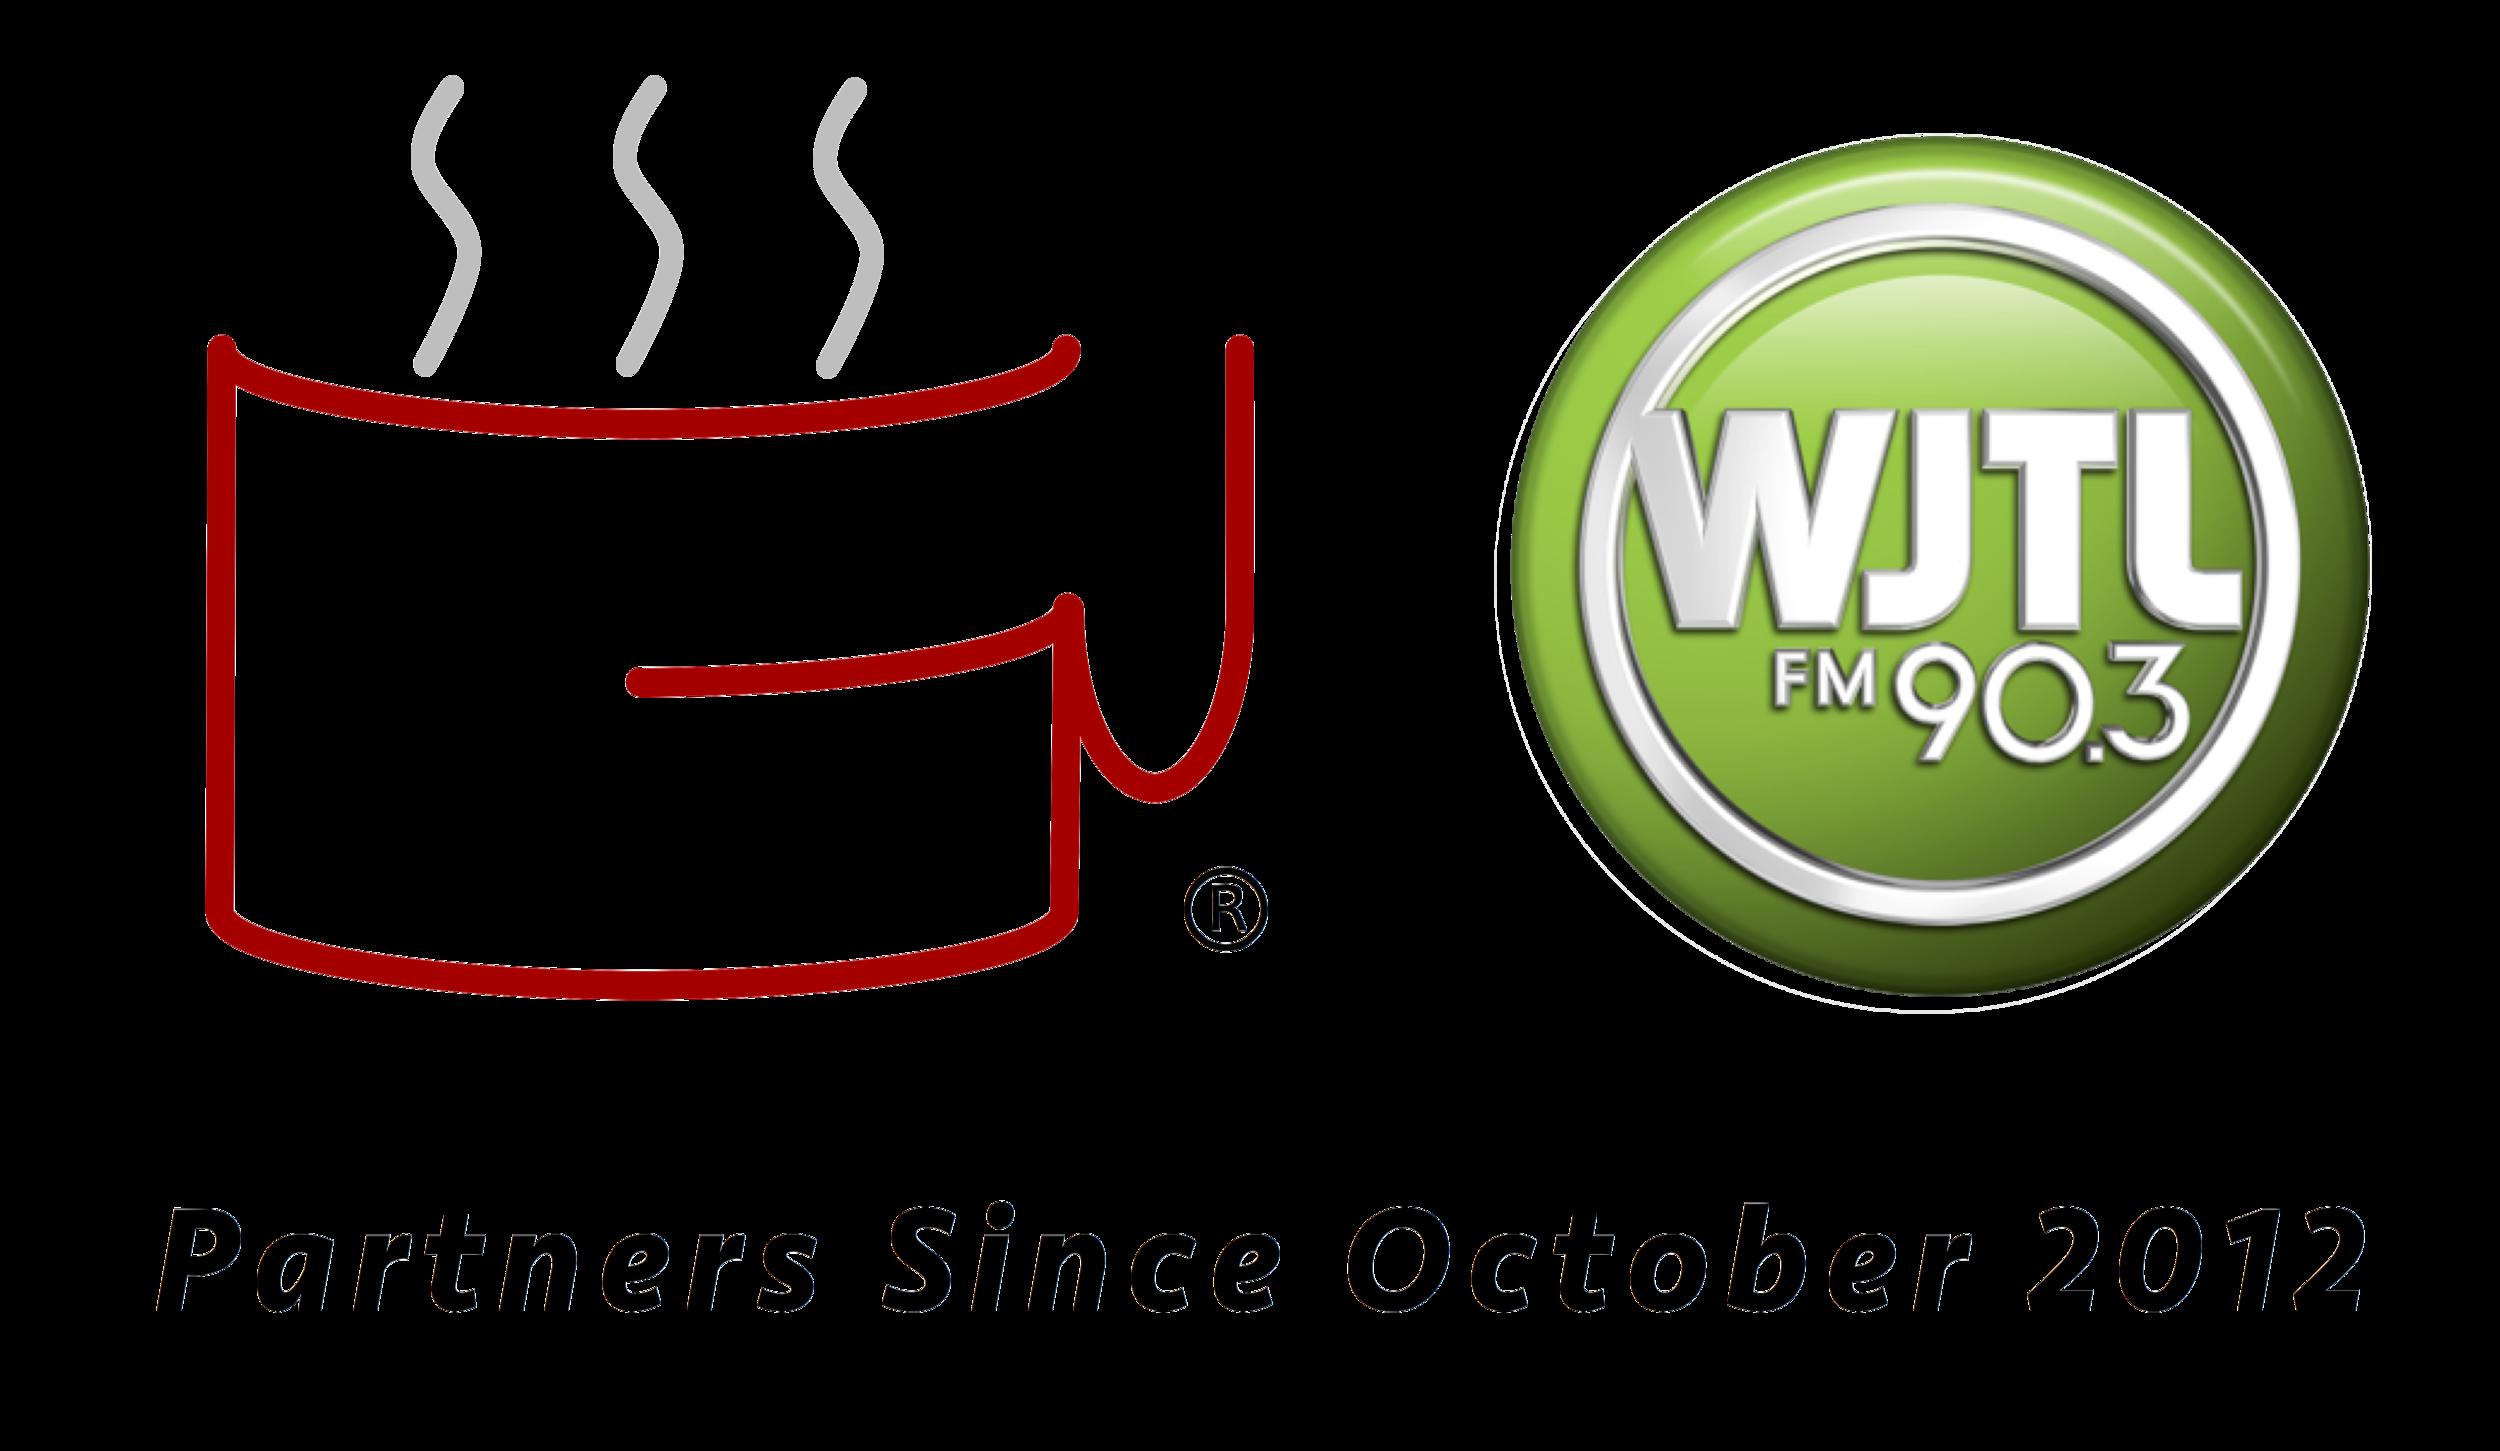 WJTL Logo Partnership.png